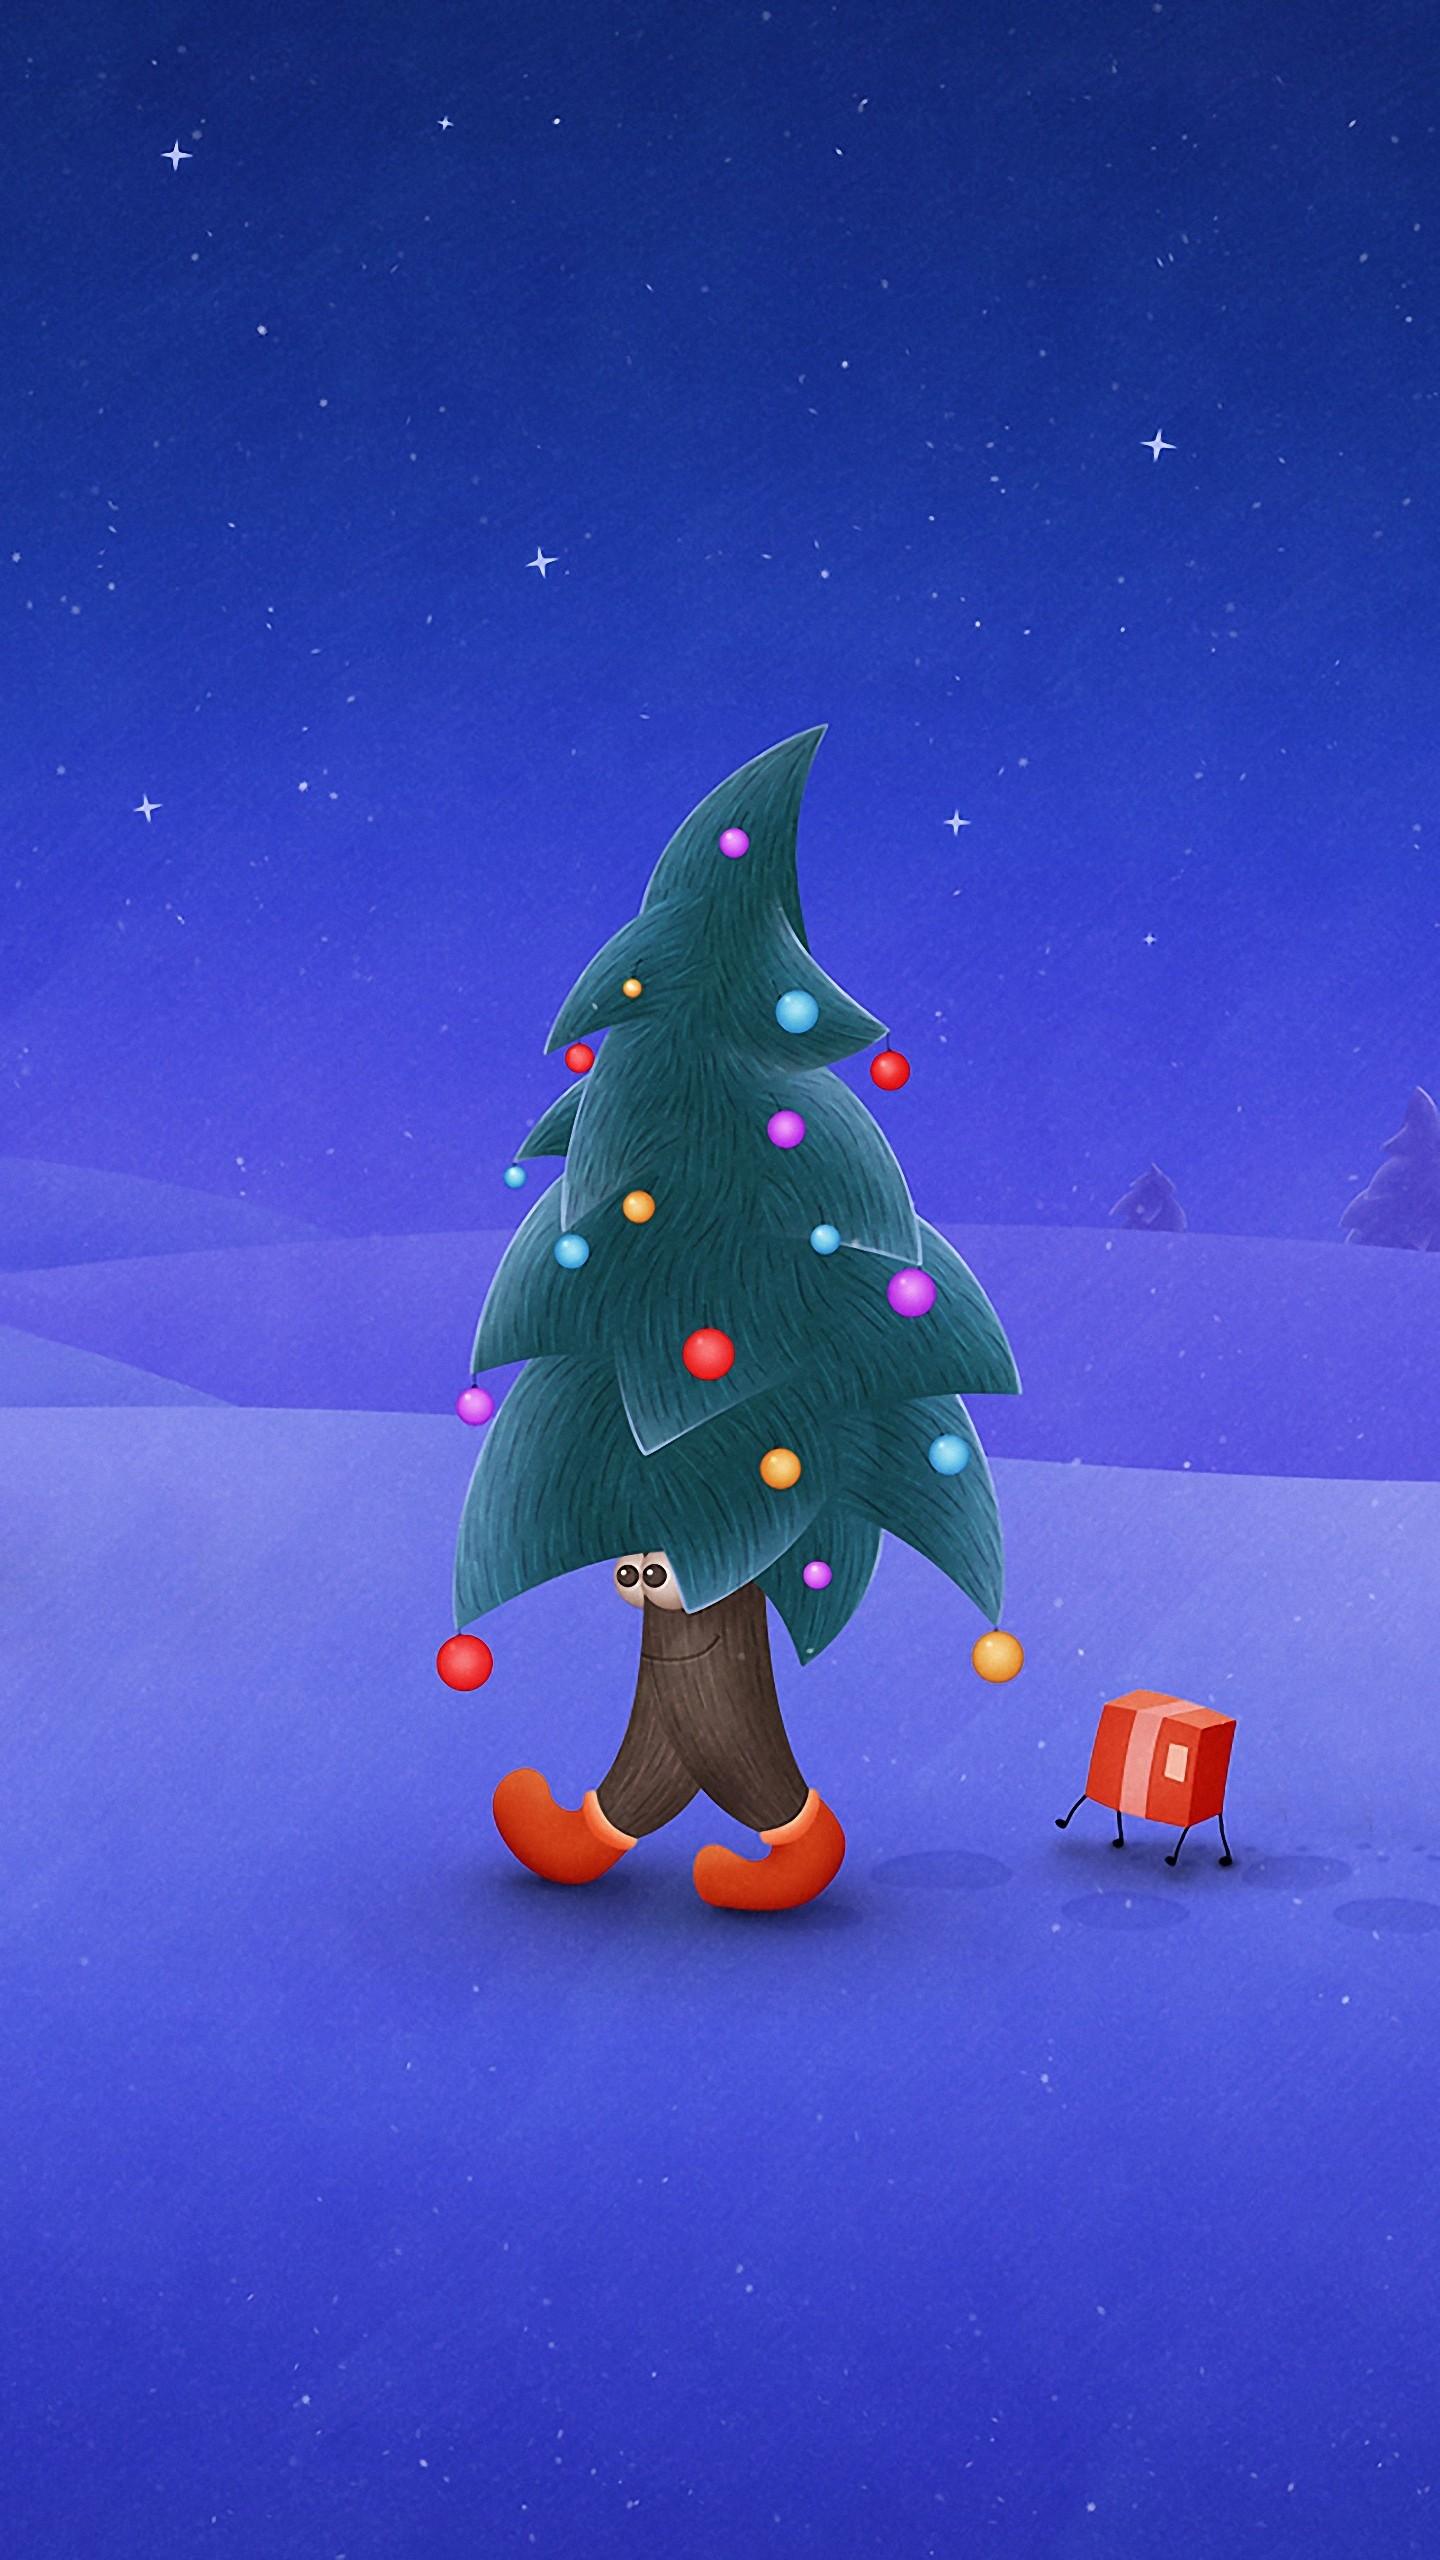 Christmas Phone Wallpaper Download Free Beautiful Wallpapers